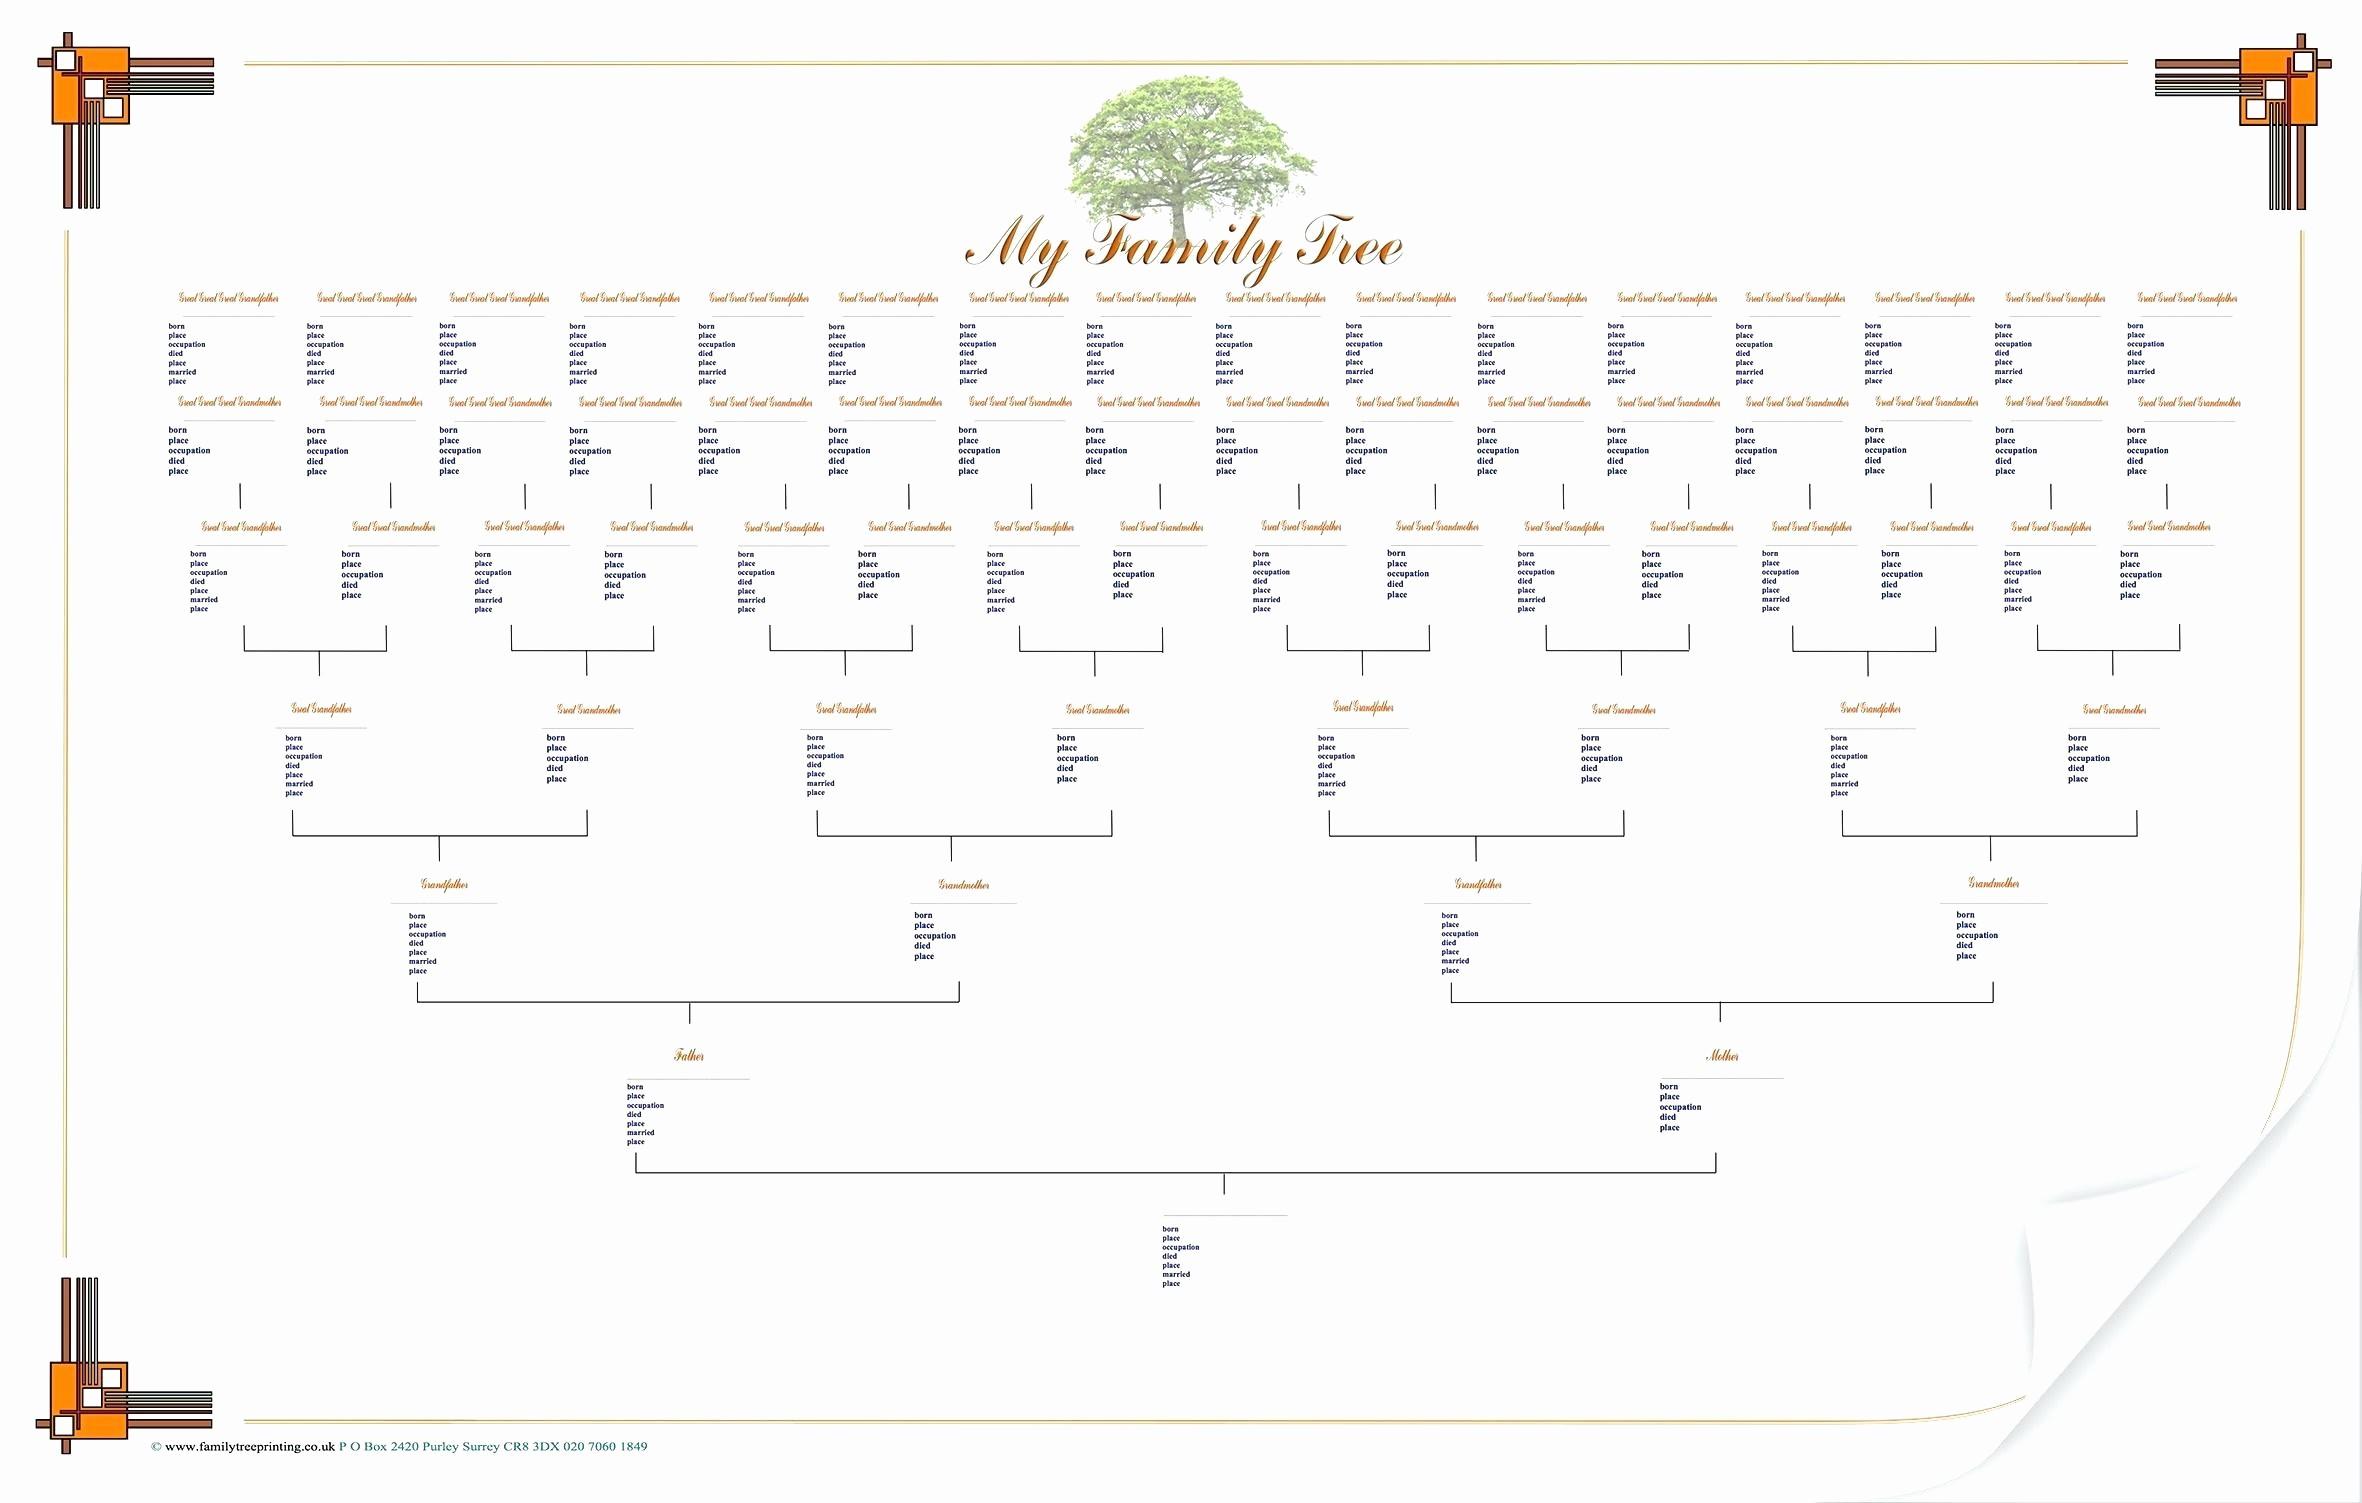 005 Shocking 7 Generation Family Tree Template Inspiration  Blank Free EditableFull